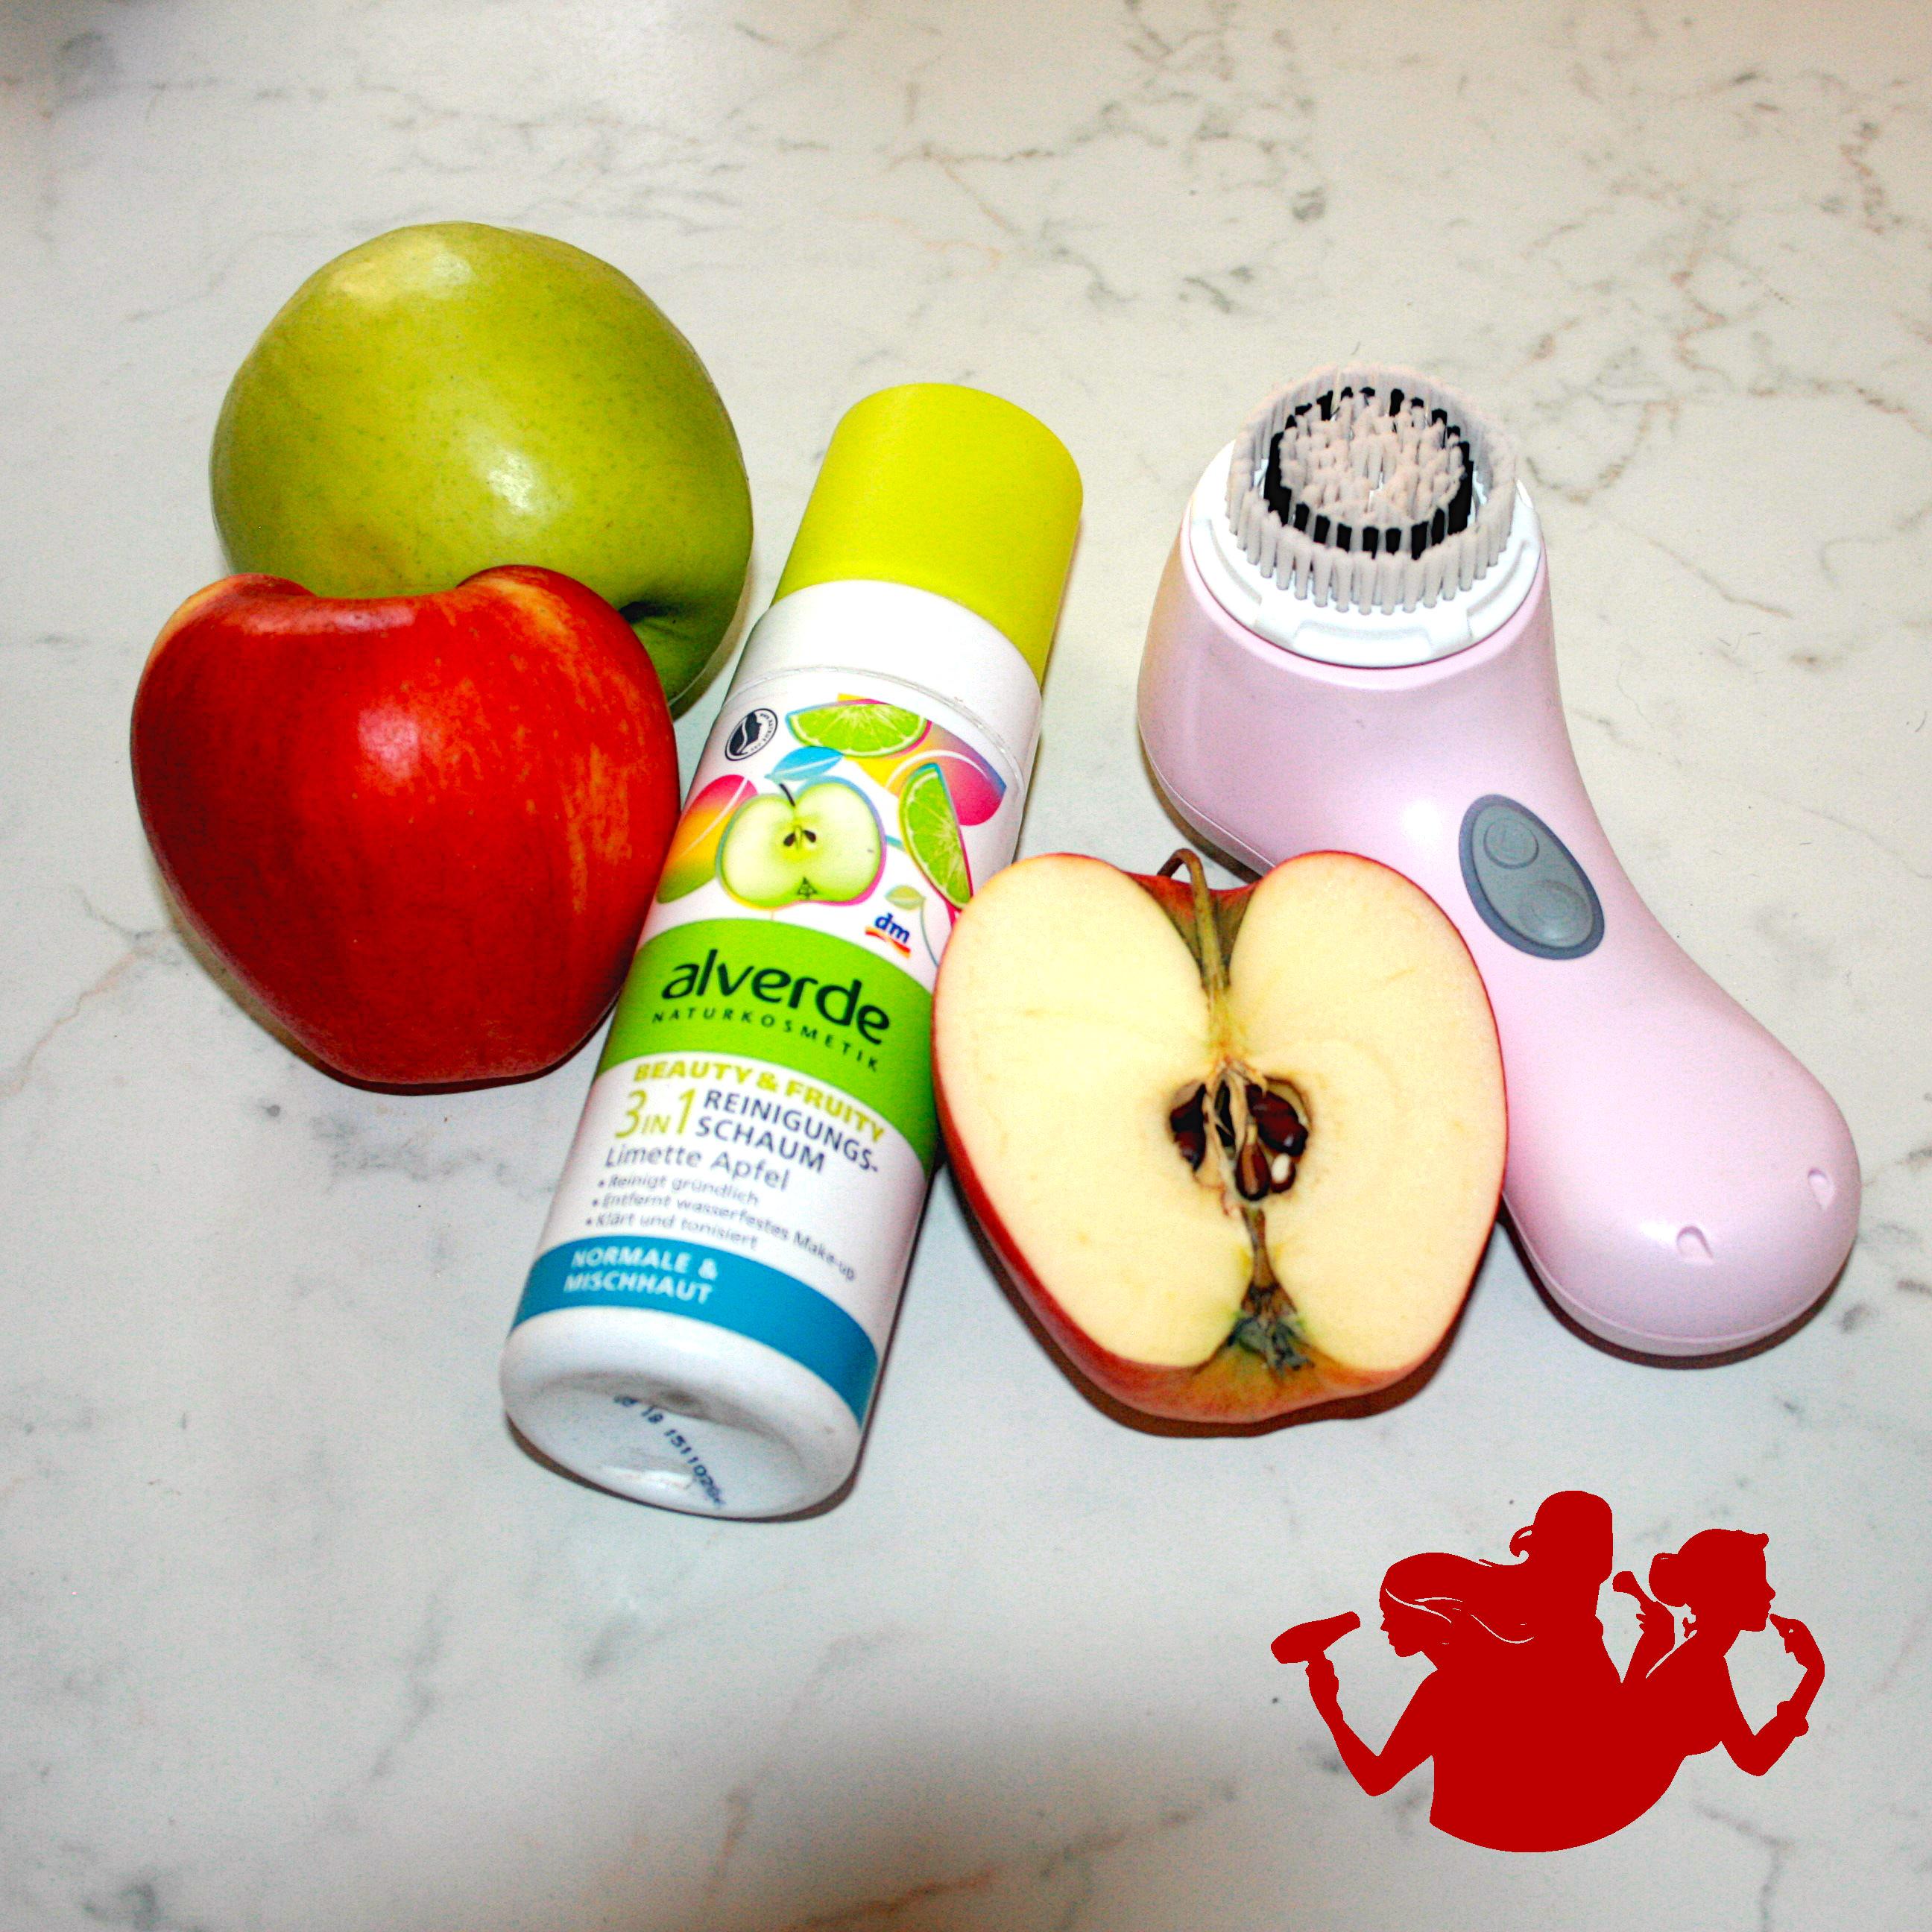 Mousse detergente 3 in 1 lime e mela – Alverde